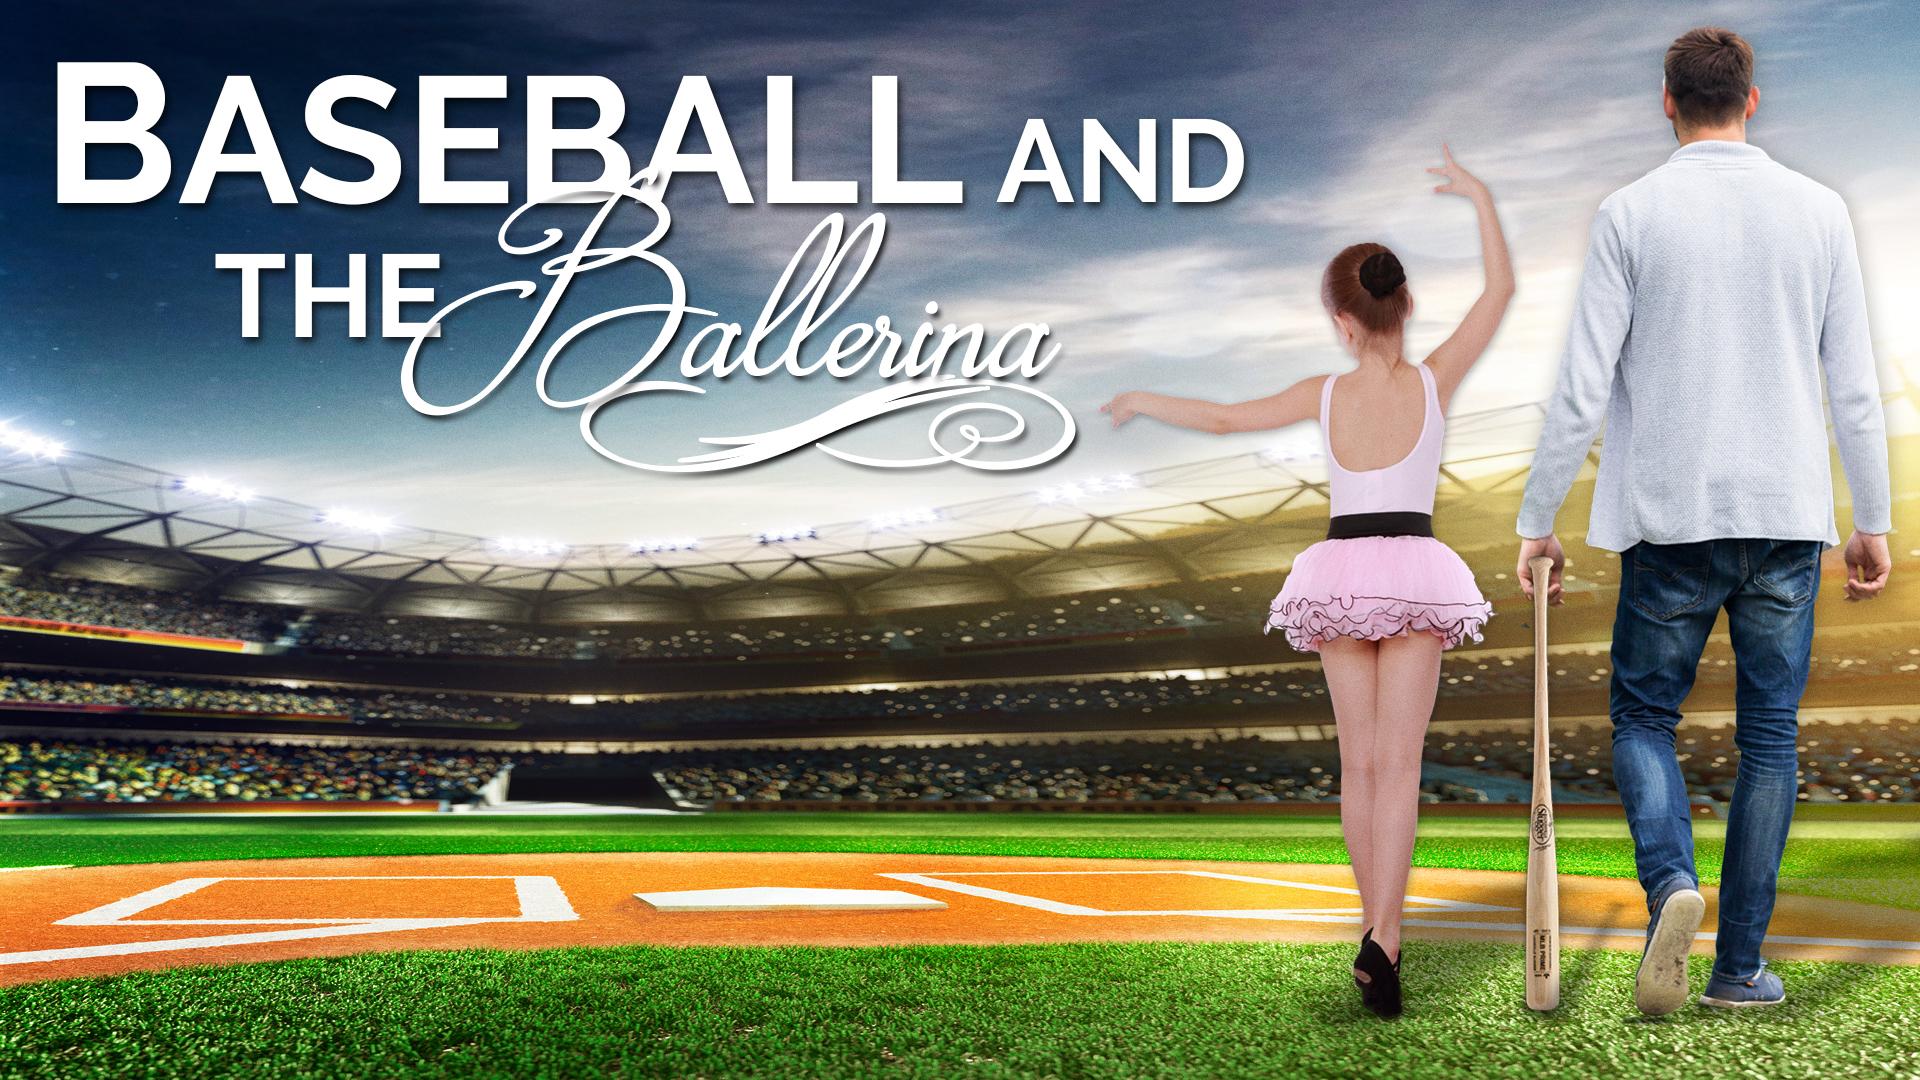 Baseball and the Ballerina